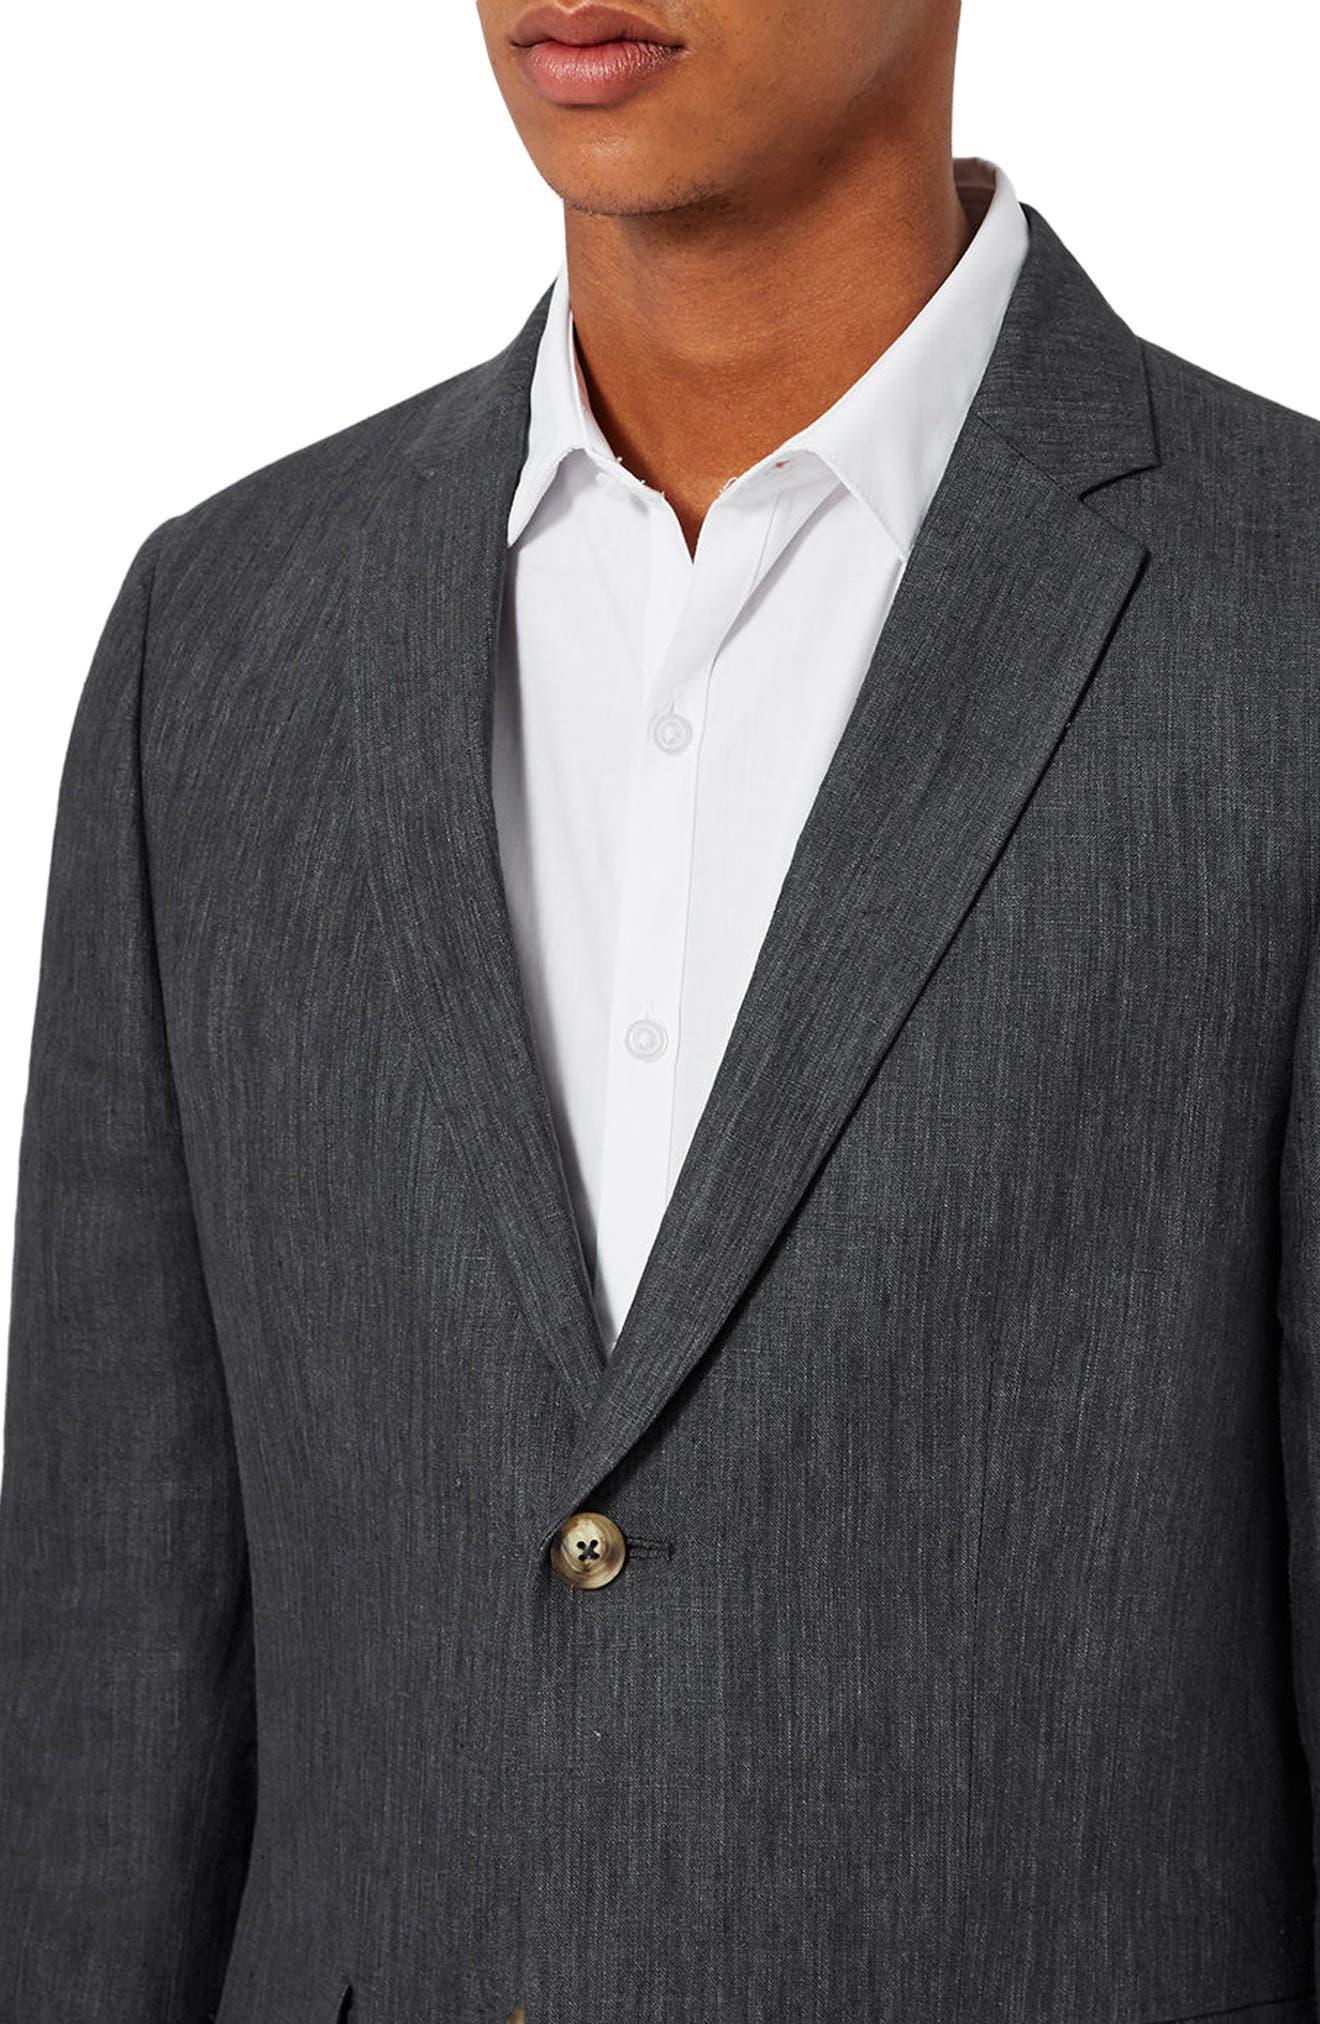 Alternate Image 4  - Topman Skinny Fit Linen Suit Jacket